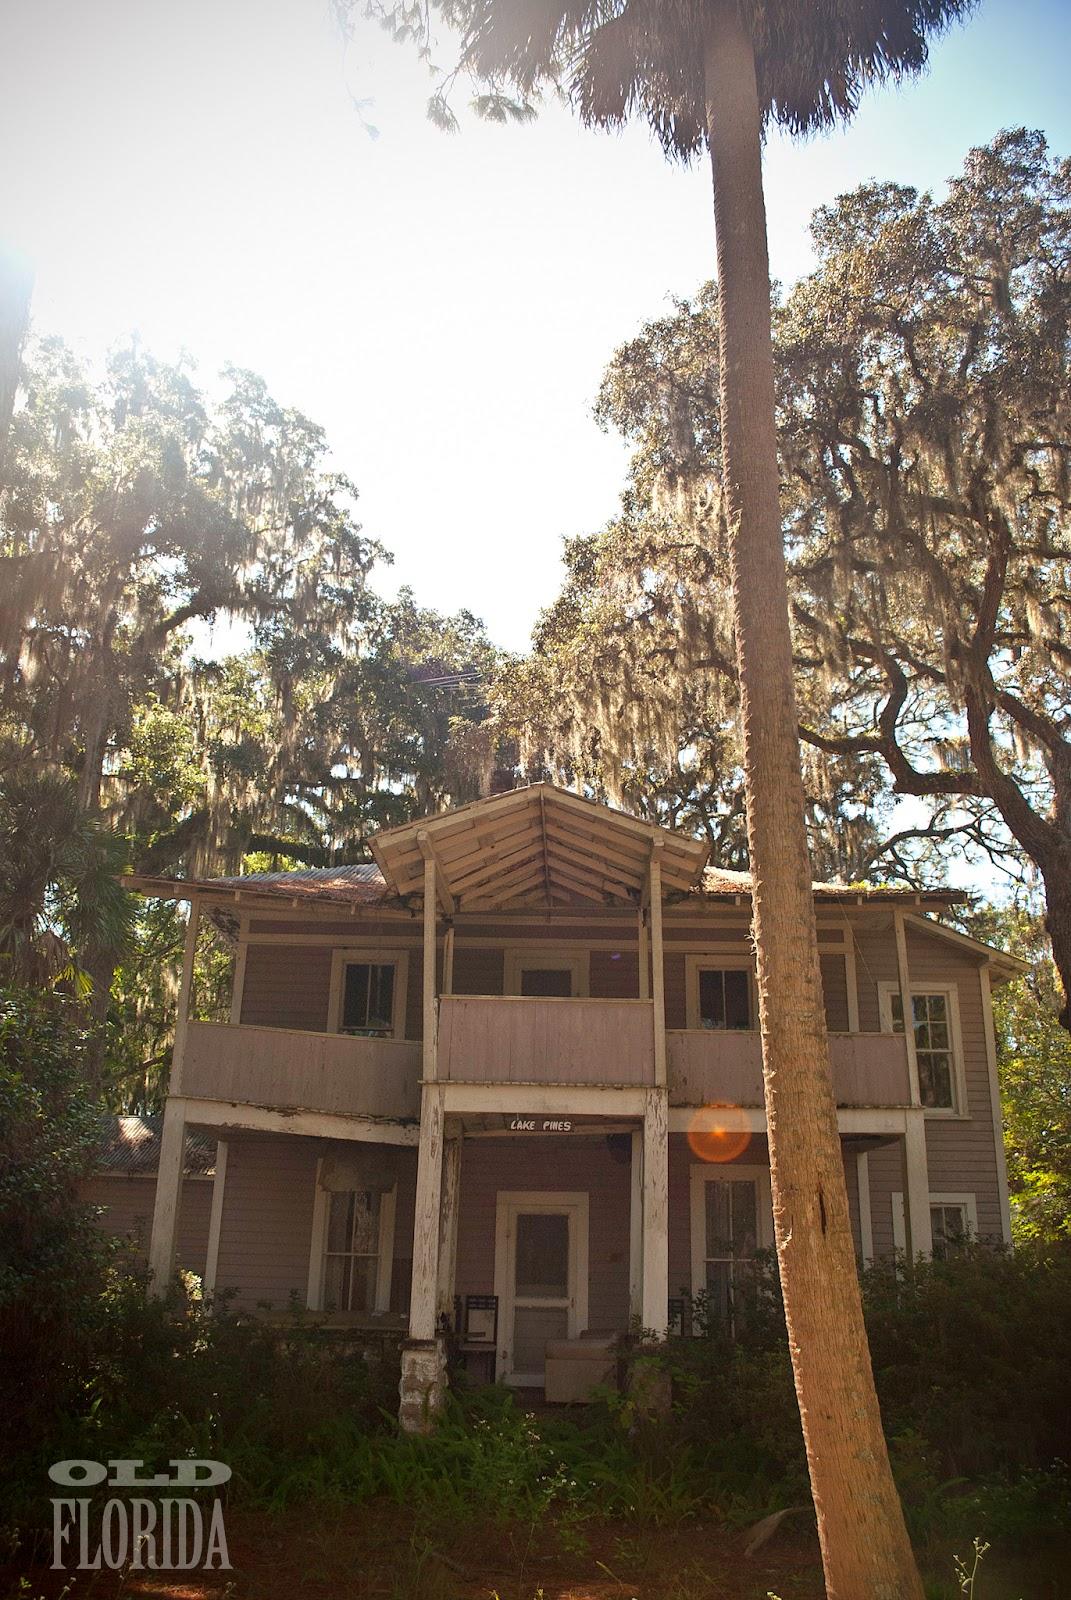 Good Day Sunshine Old Florida Village : Old florida